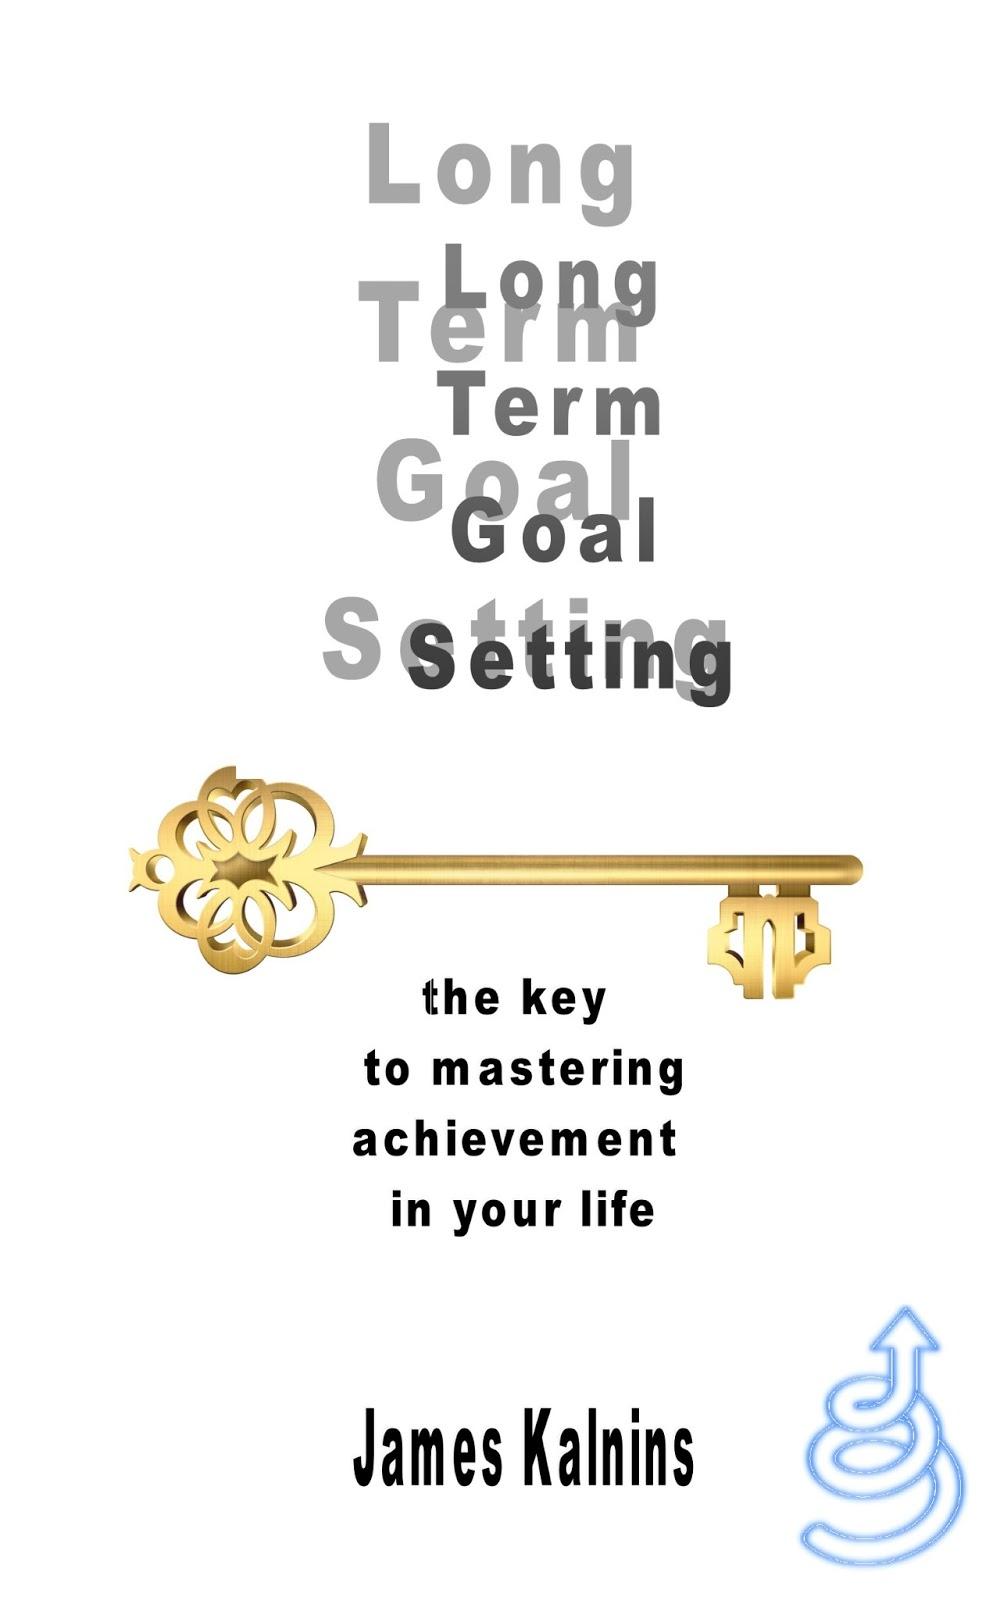 james kalnins blog published long term goal setting the key to via amazon com long setting mastering achievement ebook dp b00b92hygq ref sr 1 6 ie utf8 qid 1359740111 sr 8 6 keywords james kalnins